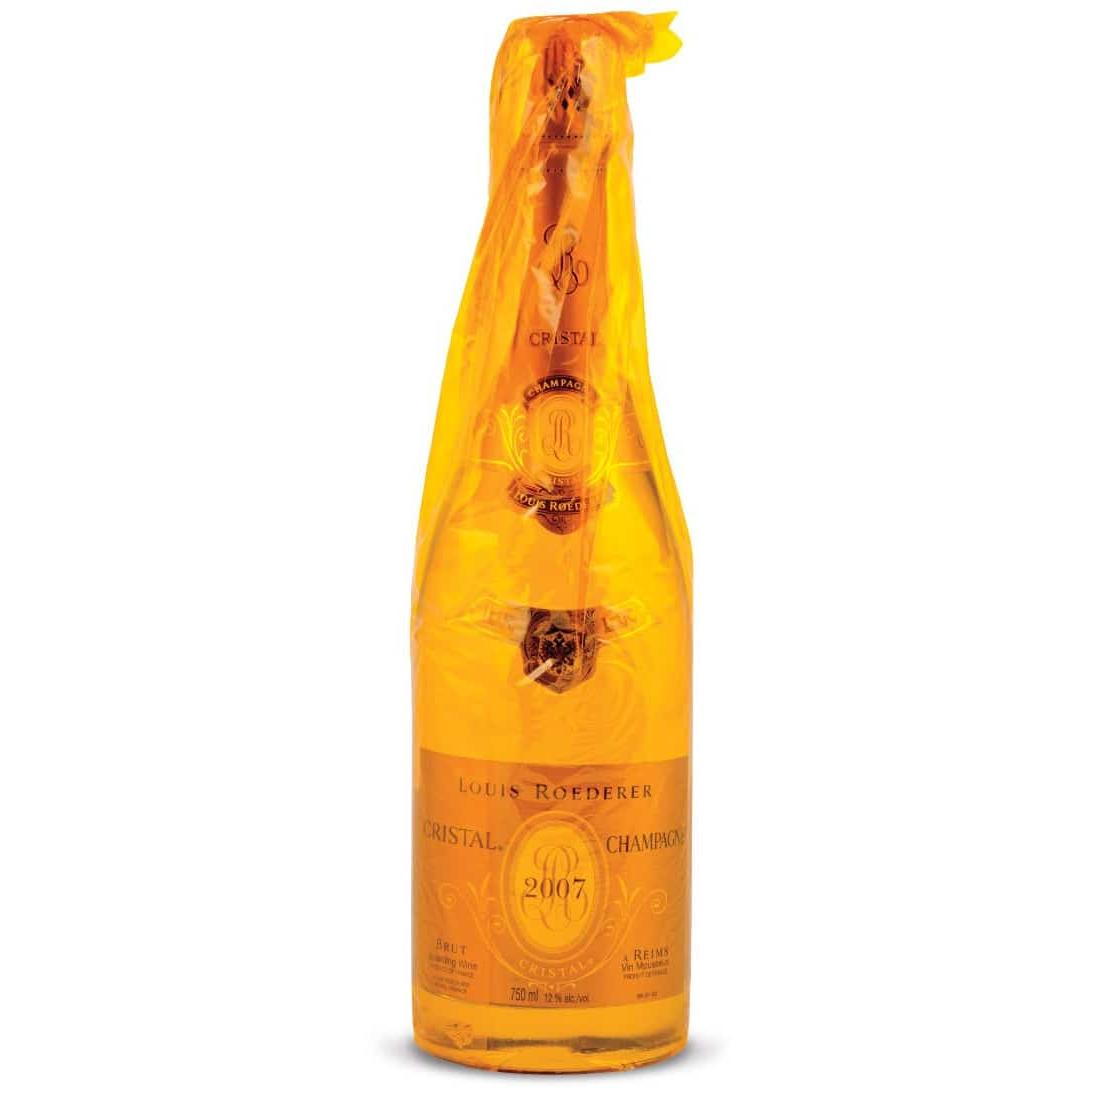 louis roederer cristal 2007 comprar cava champagne louis roederer cristal 2007 licorea. Black Bedroom Furniture Sets. Home Design Ideas